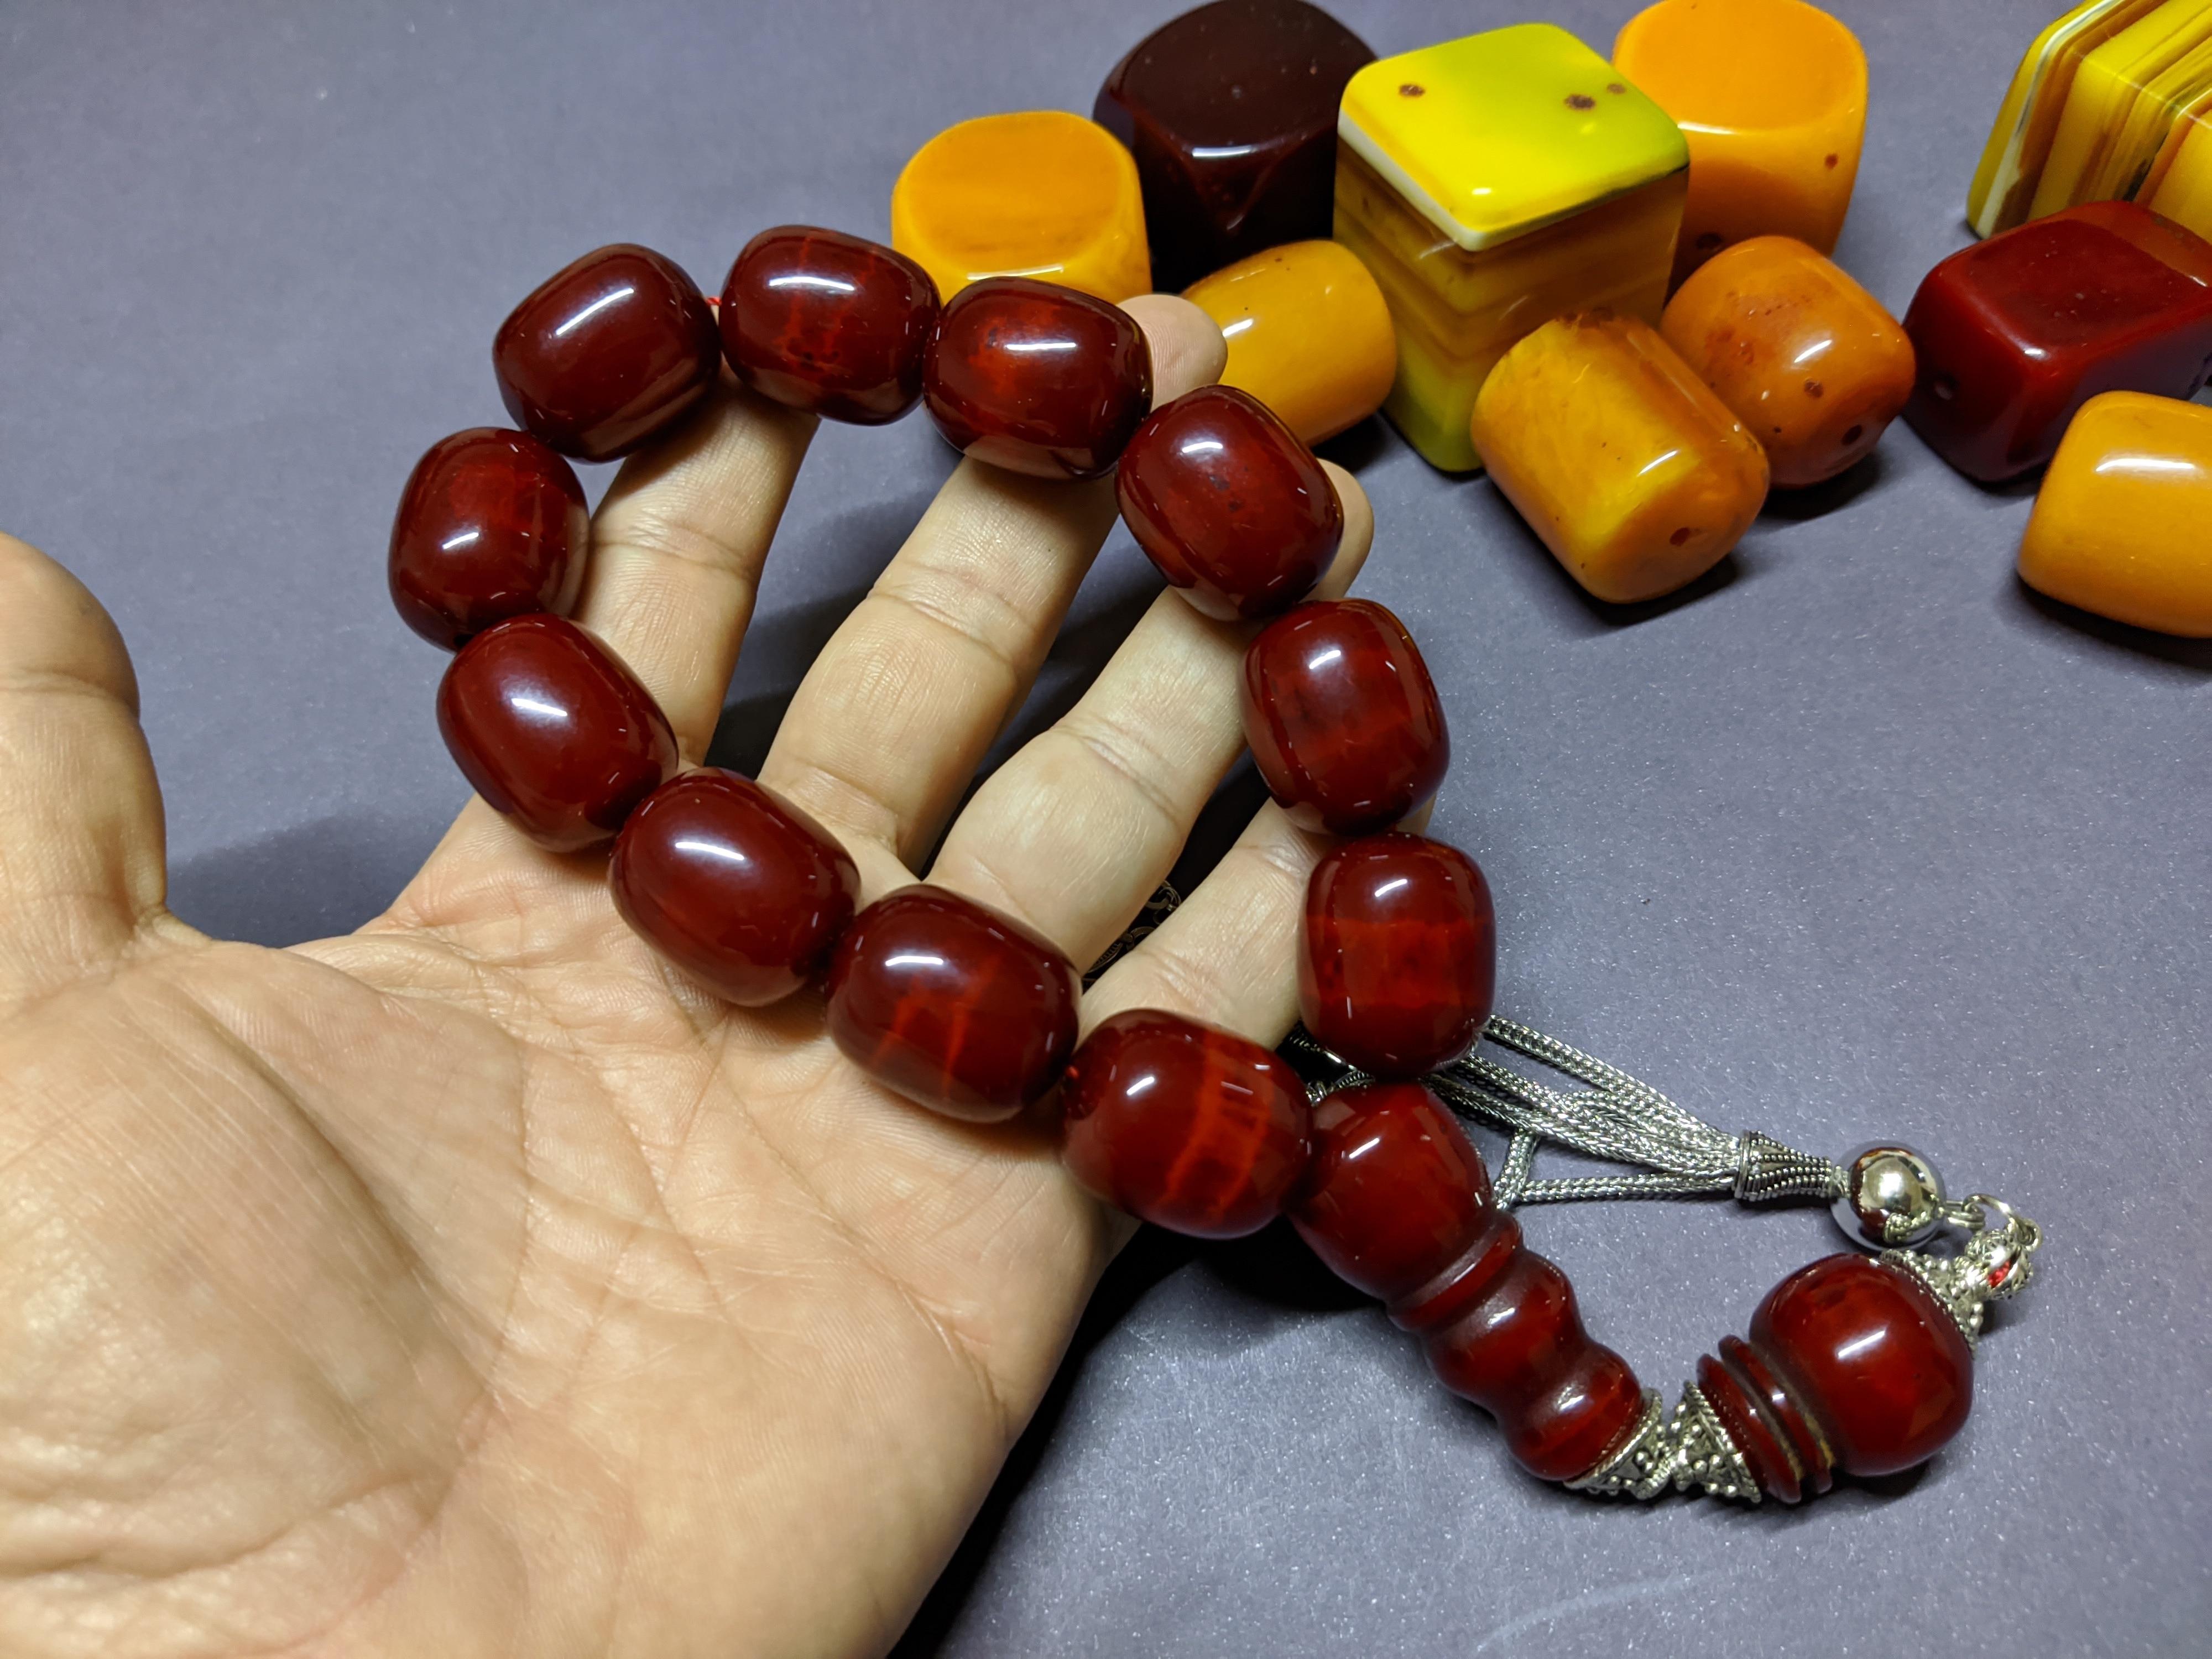 Ottoman Faturan German Amber Sandalous Misbaha Prayer Beads Islamic Gift Tasbih Tasbeeh Tasbeh Rosary Tasbih # 26D